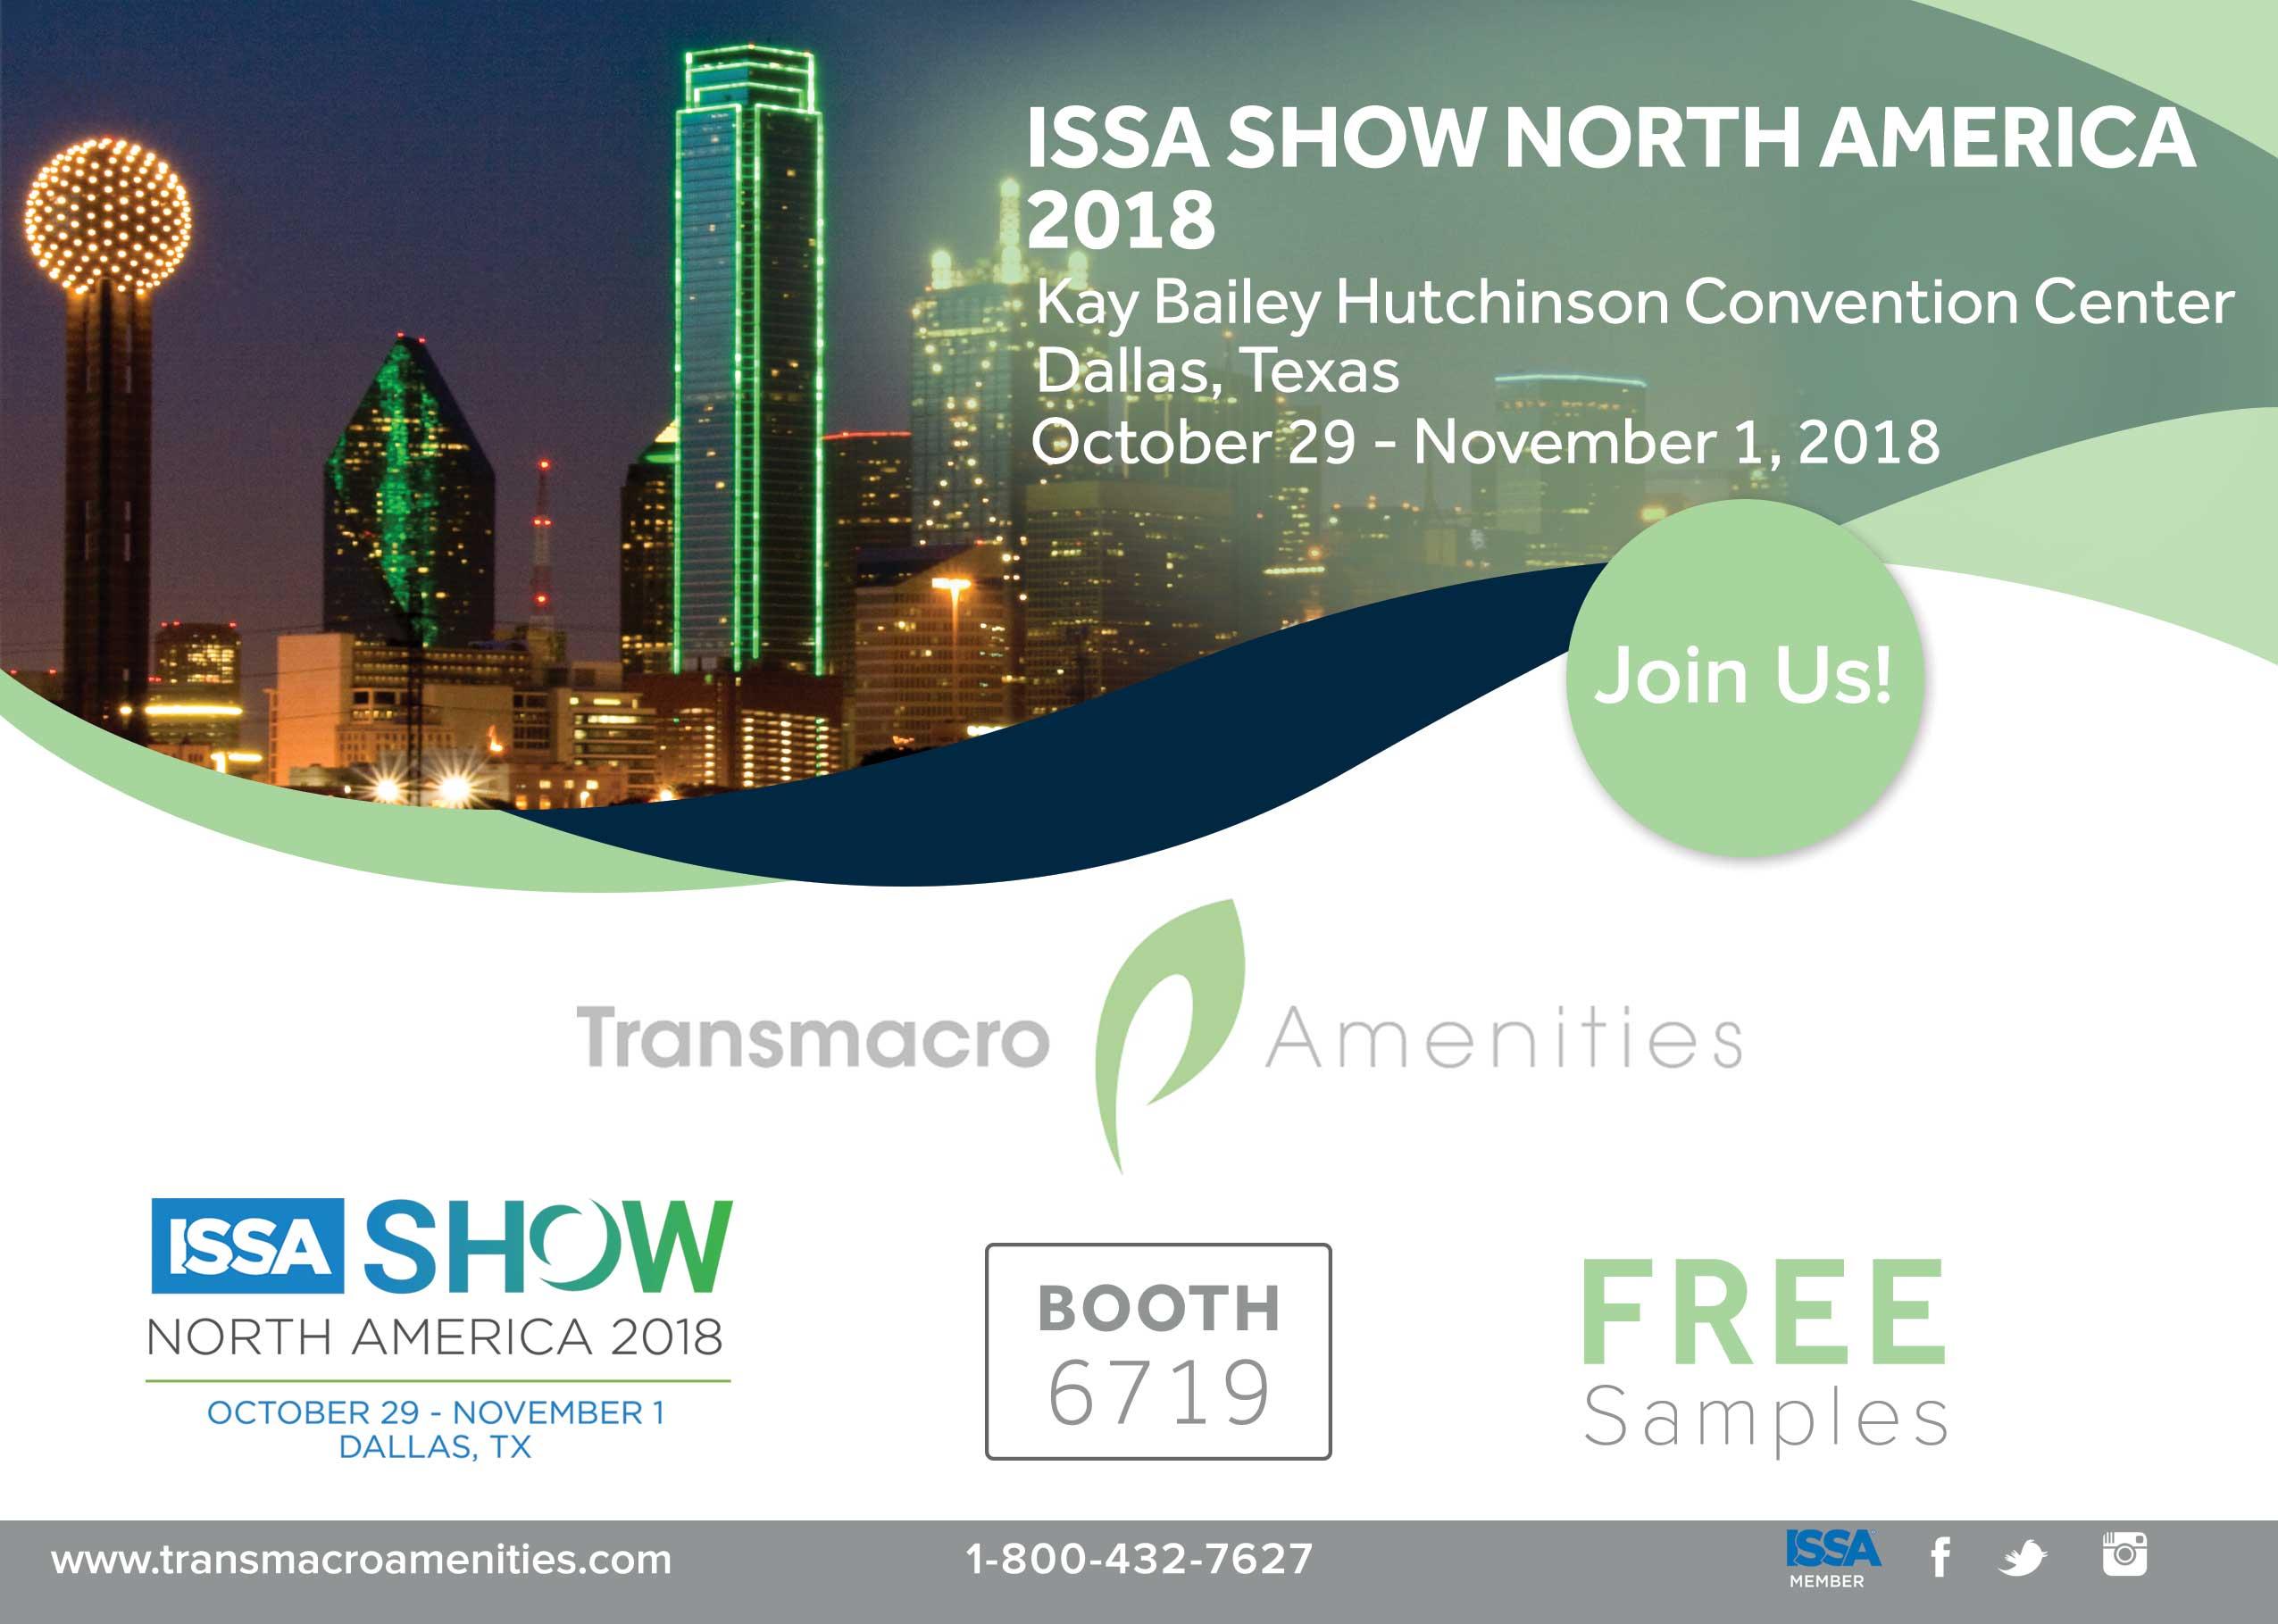 2018 ISSA Interclean Show Transmacro